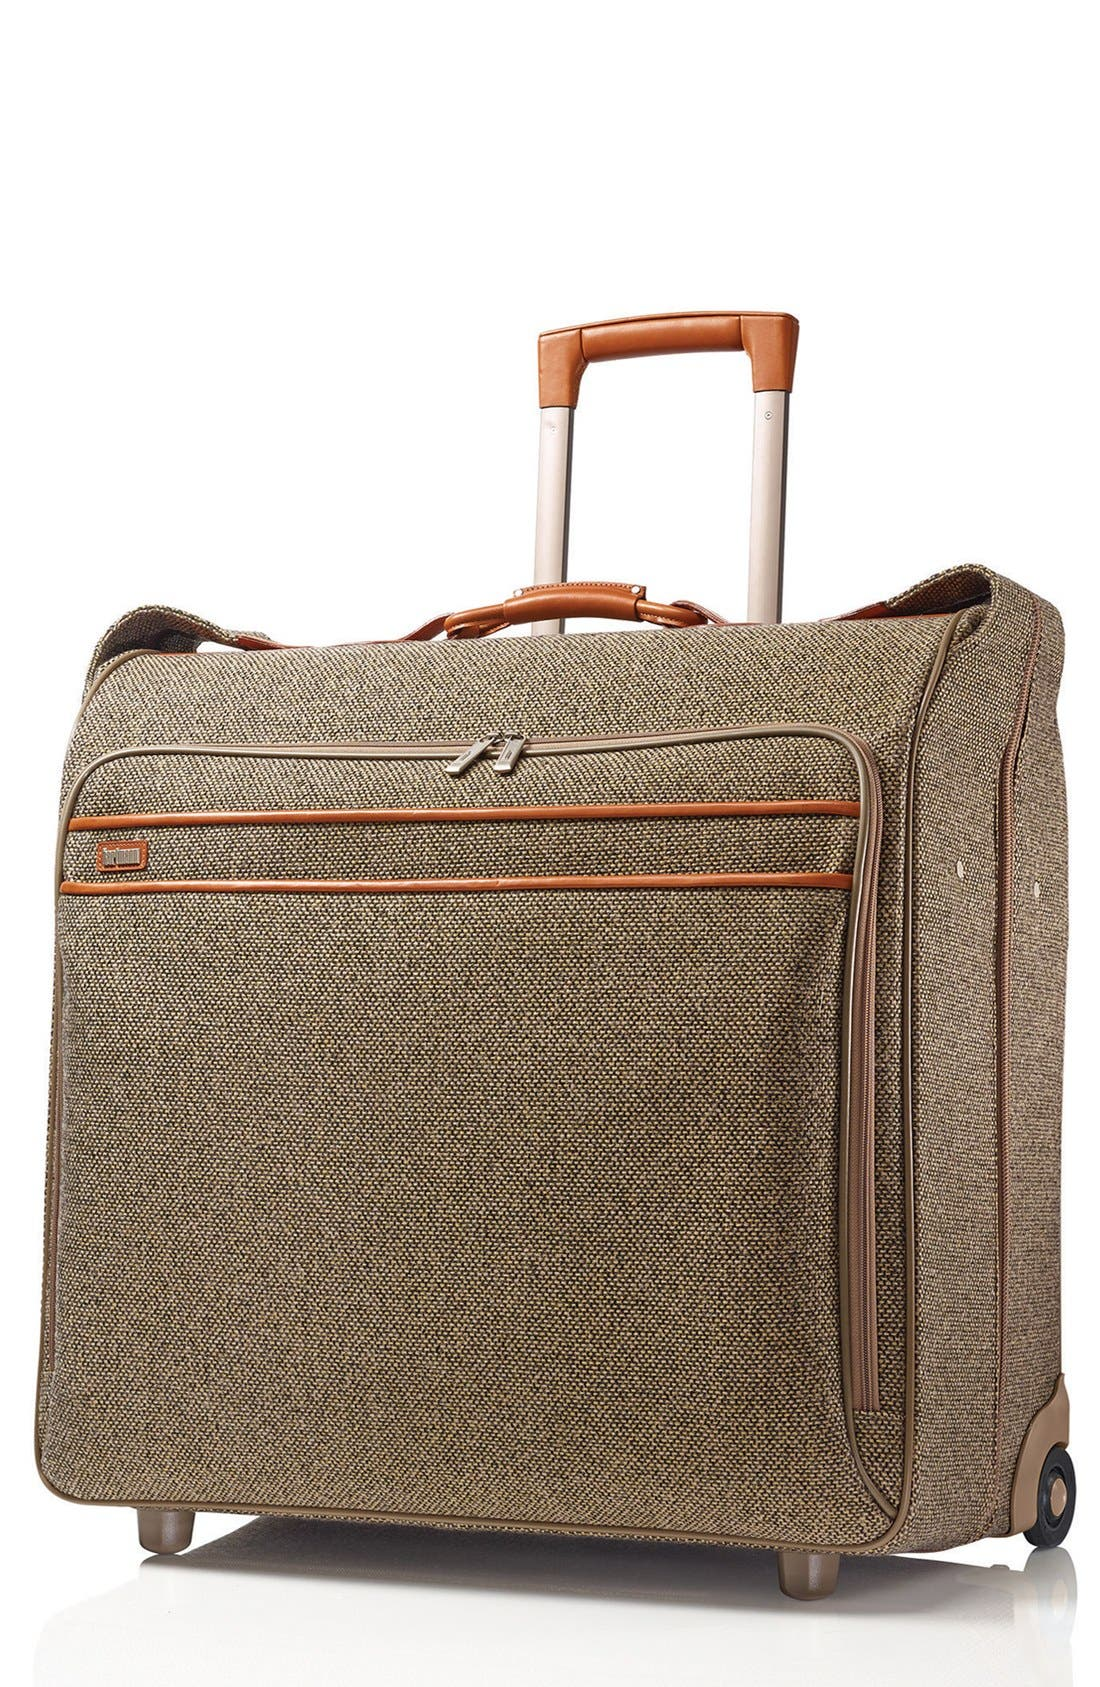 'Tweed Belting' Wheeled Garment Bag, Main, color, 217